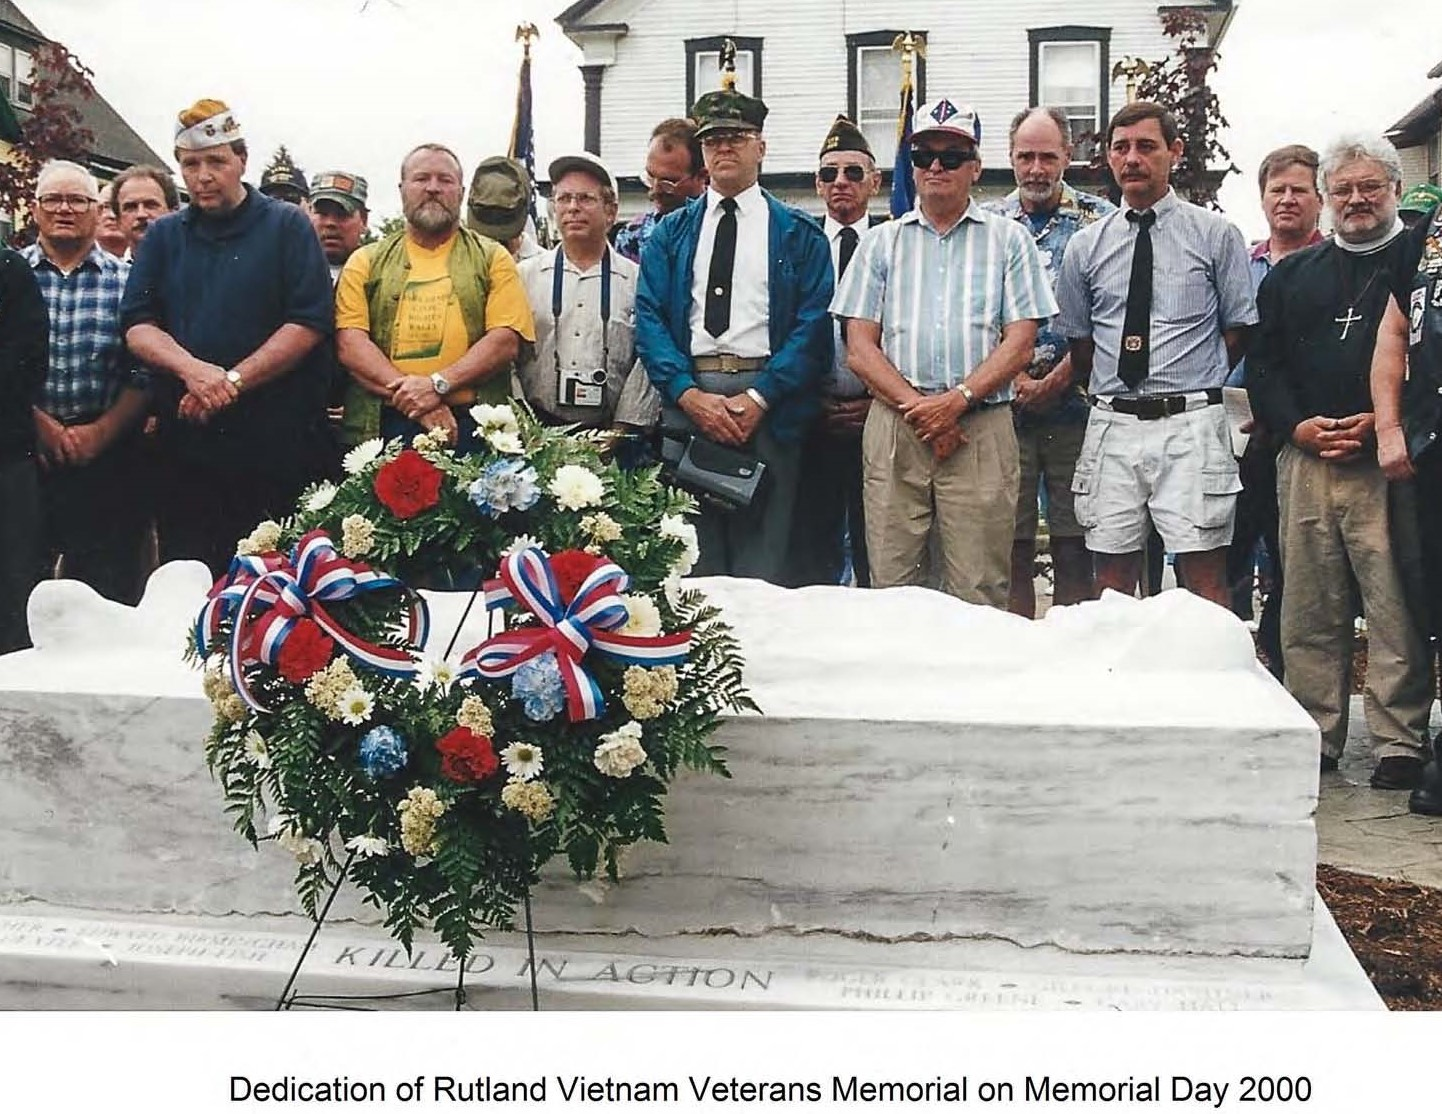 RCVV 6 - Memorial Dedication 2000xx